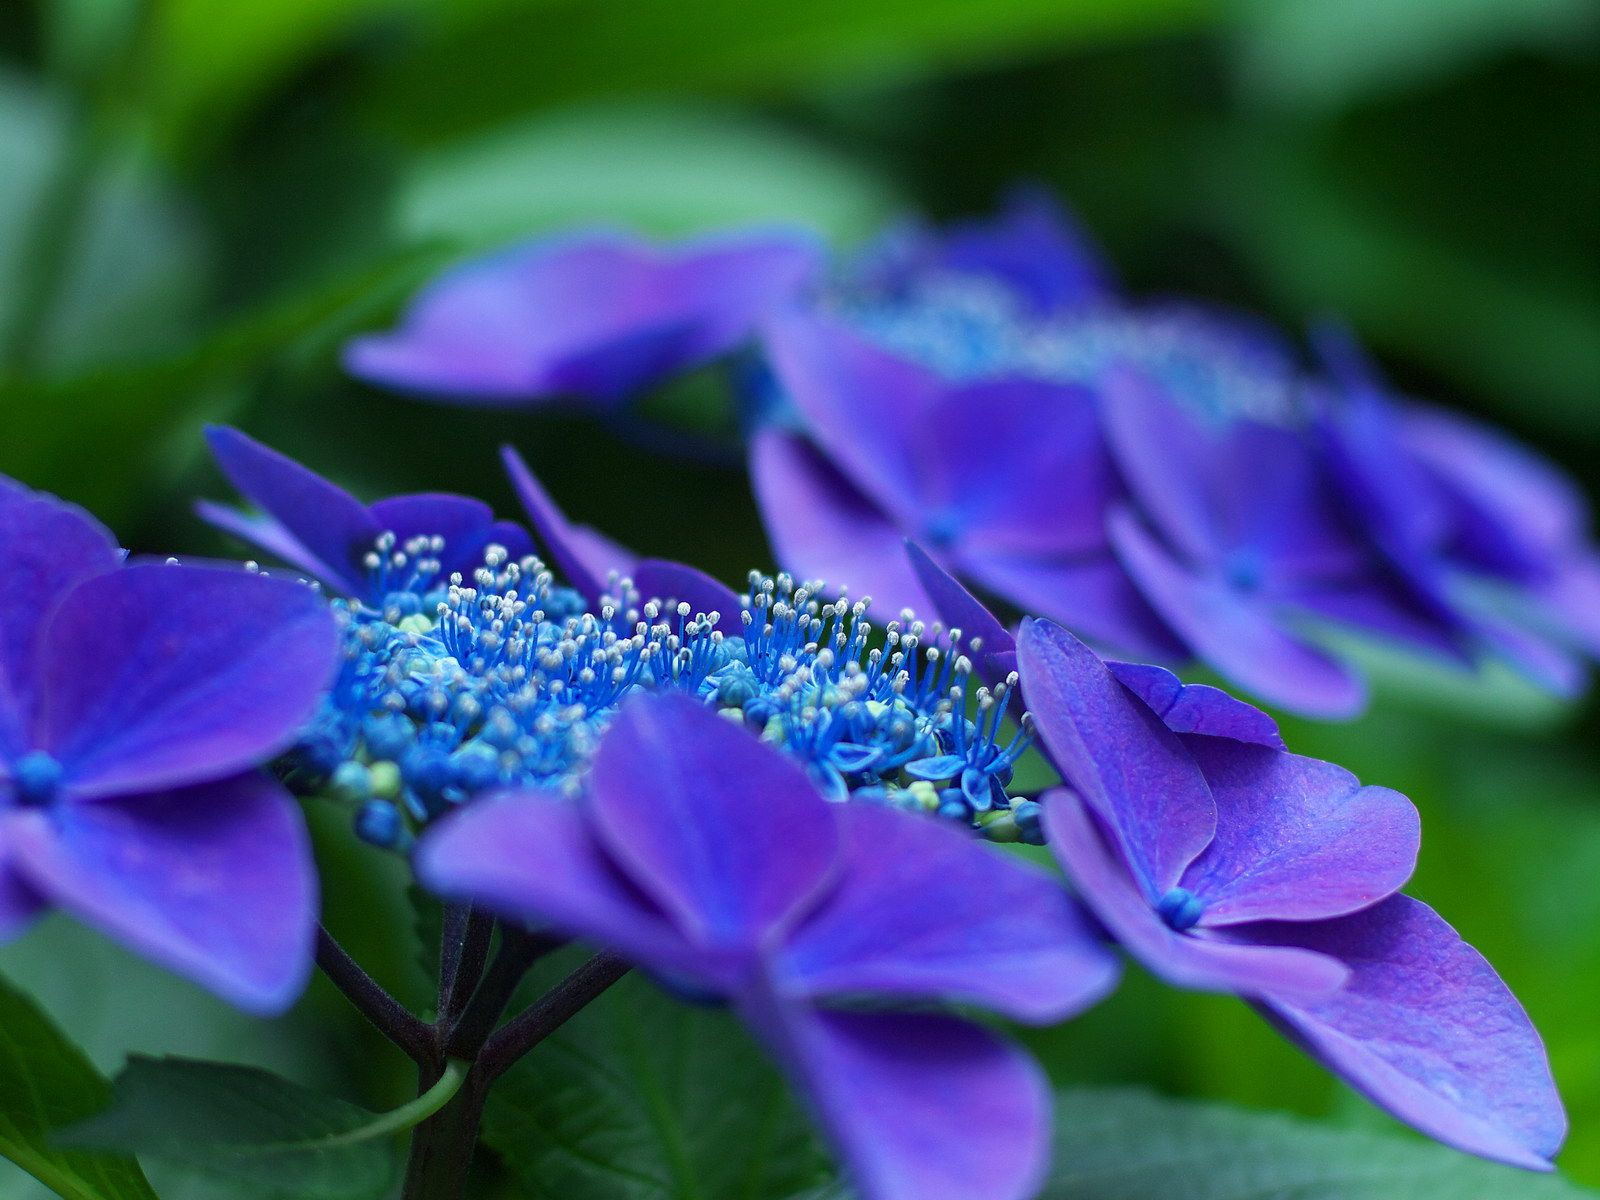 Hydrangea Very Beautiful Flowers Hydrangea Colors Flowers Nature